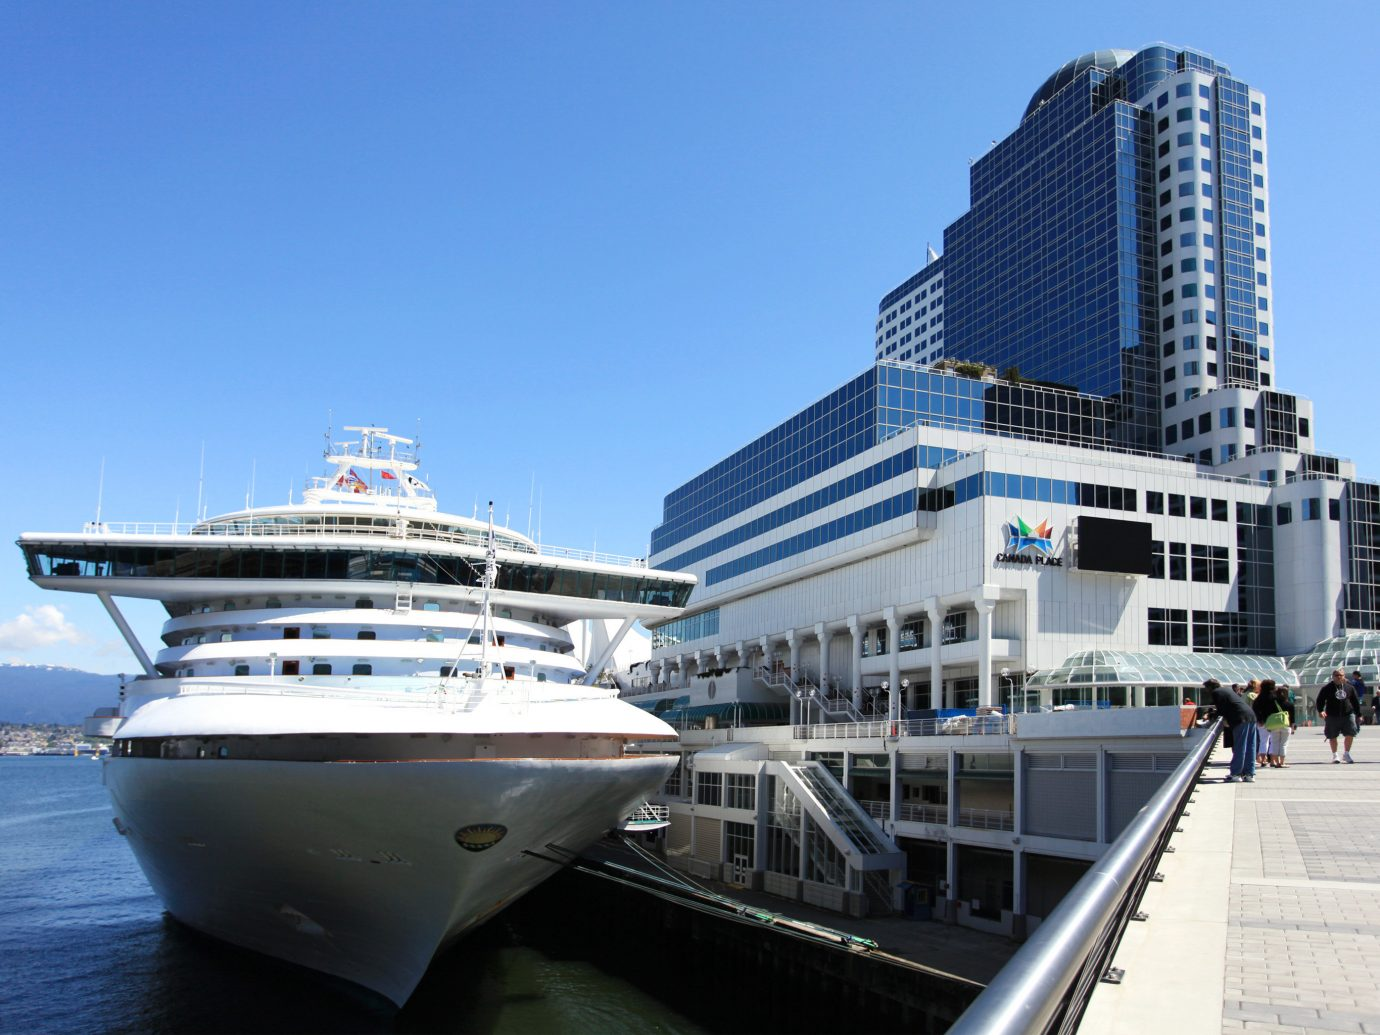 Trip Ideas sky outdoor Boat water cruise ship passenger ship vehicle motor ship ship ocean liner watercraft yacht marina luxury yacht dock ferry Sea docked